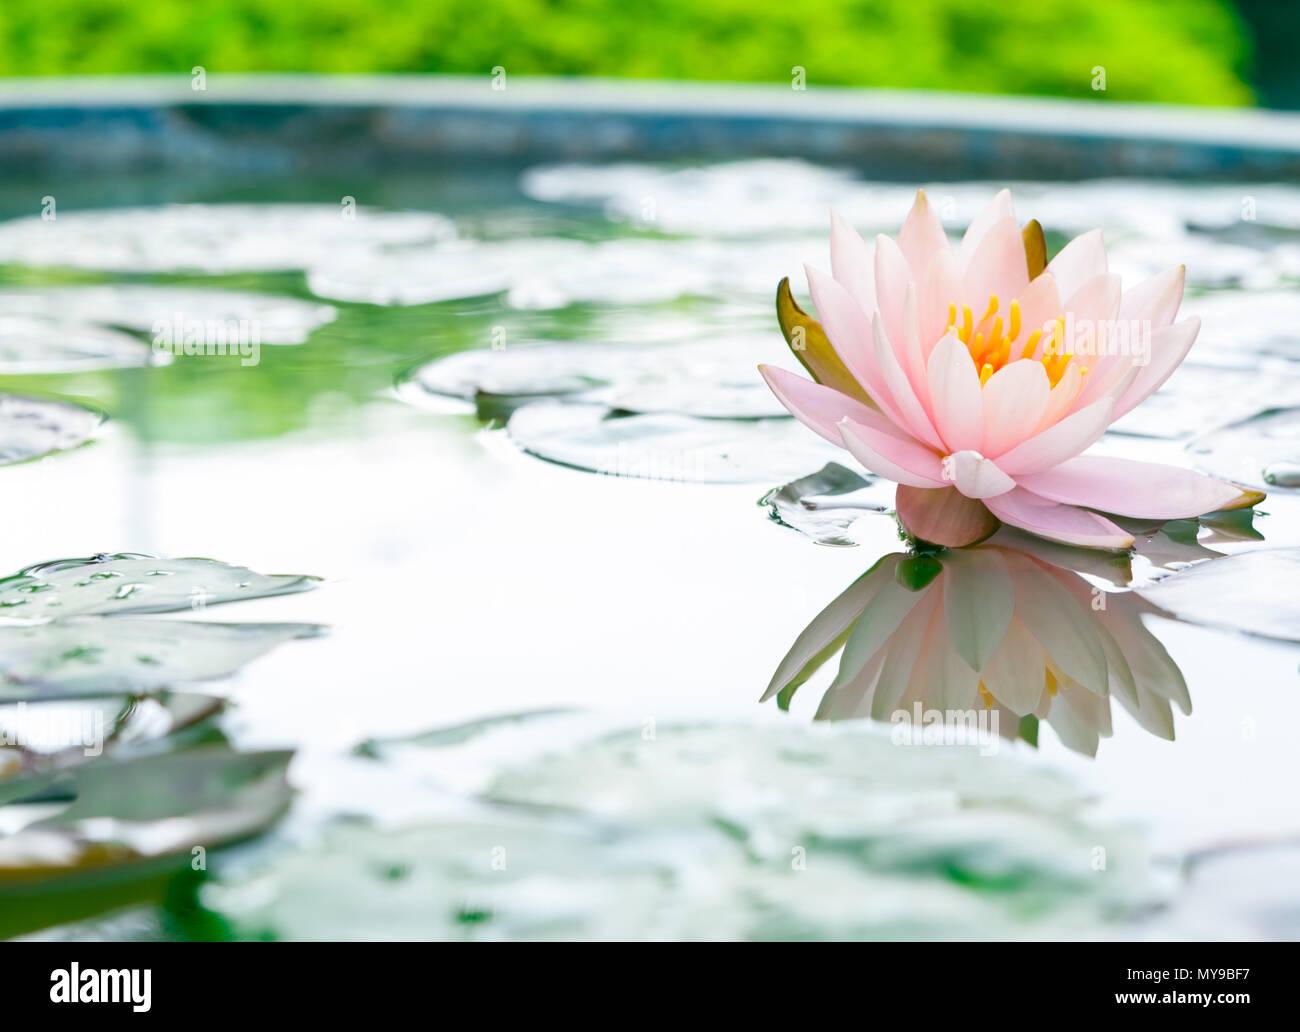 Beautiful pink lotus flower in pond stock photo 188906011 alamy beautiful pink lotus flower in pond mightylinksfo